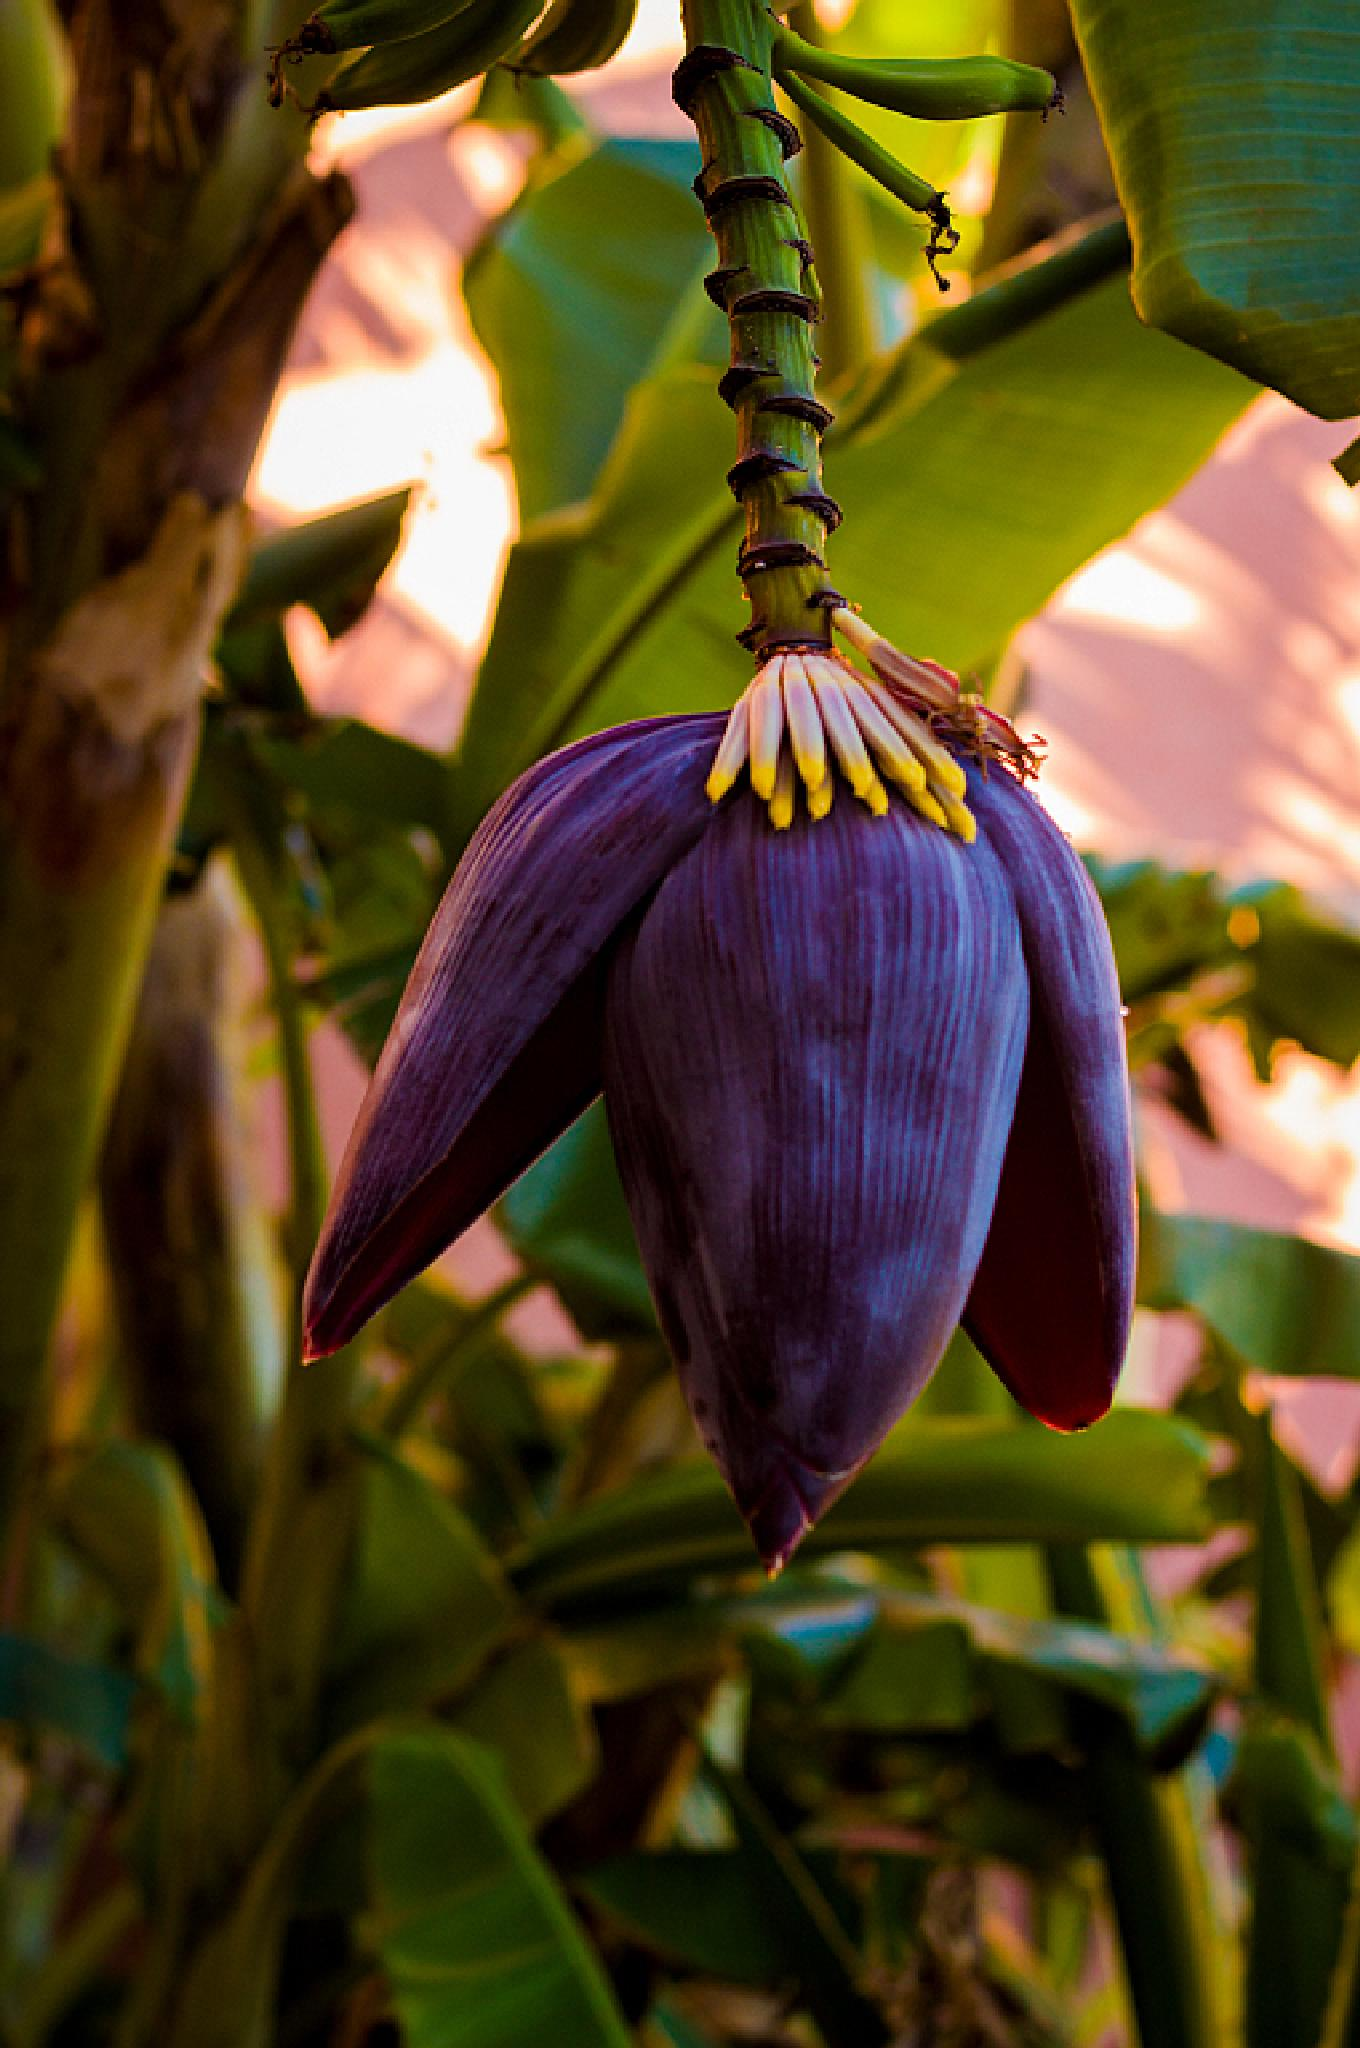 Banana flower by magdalena.lenar